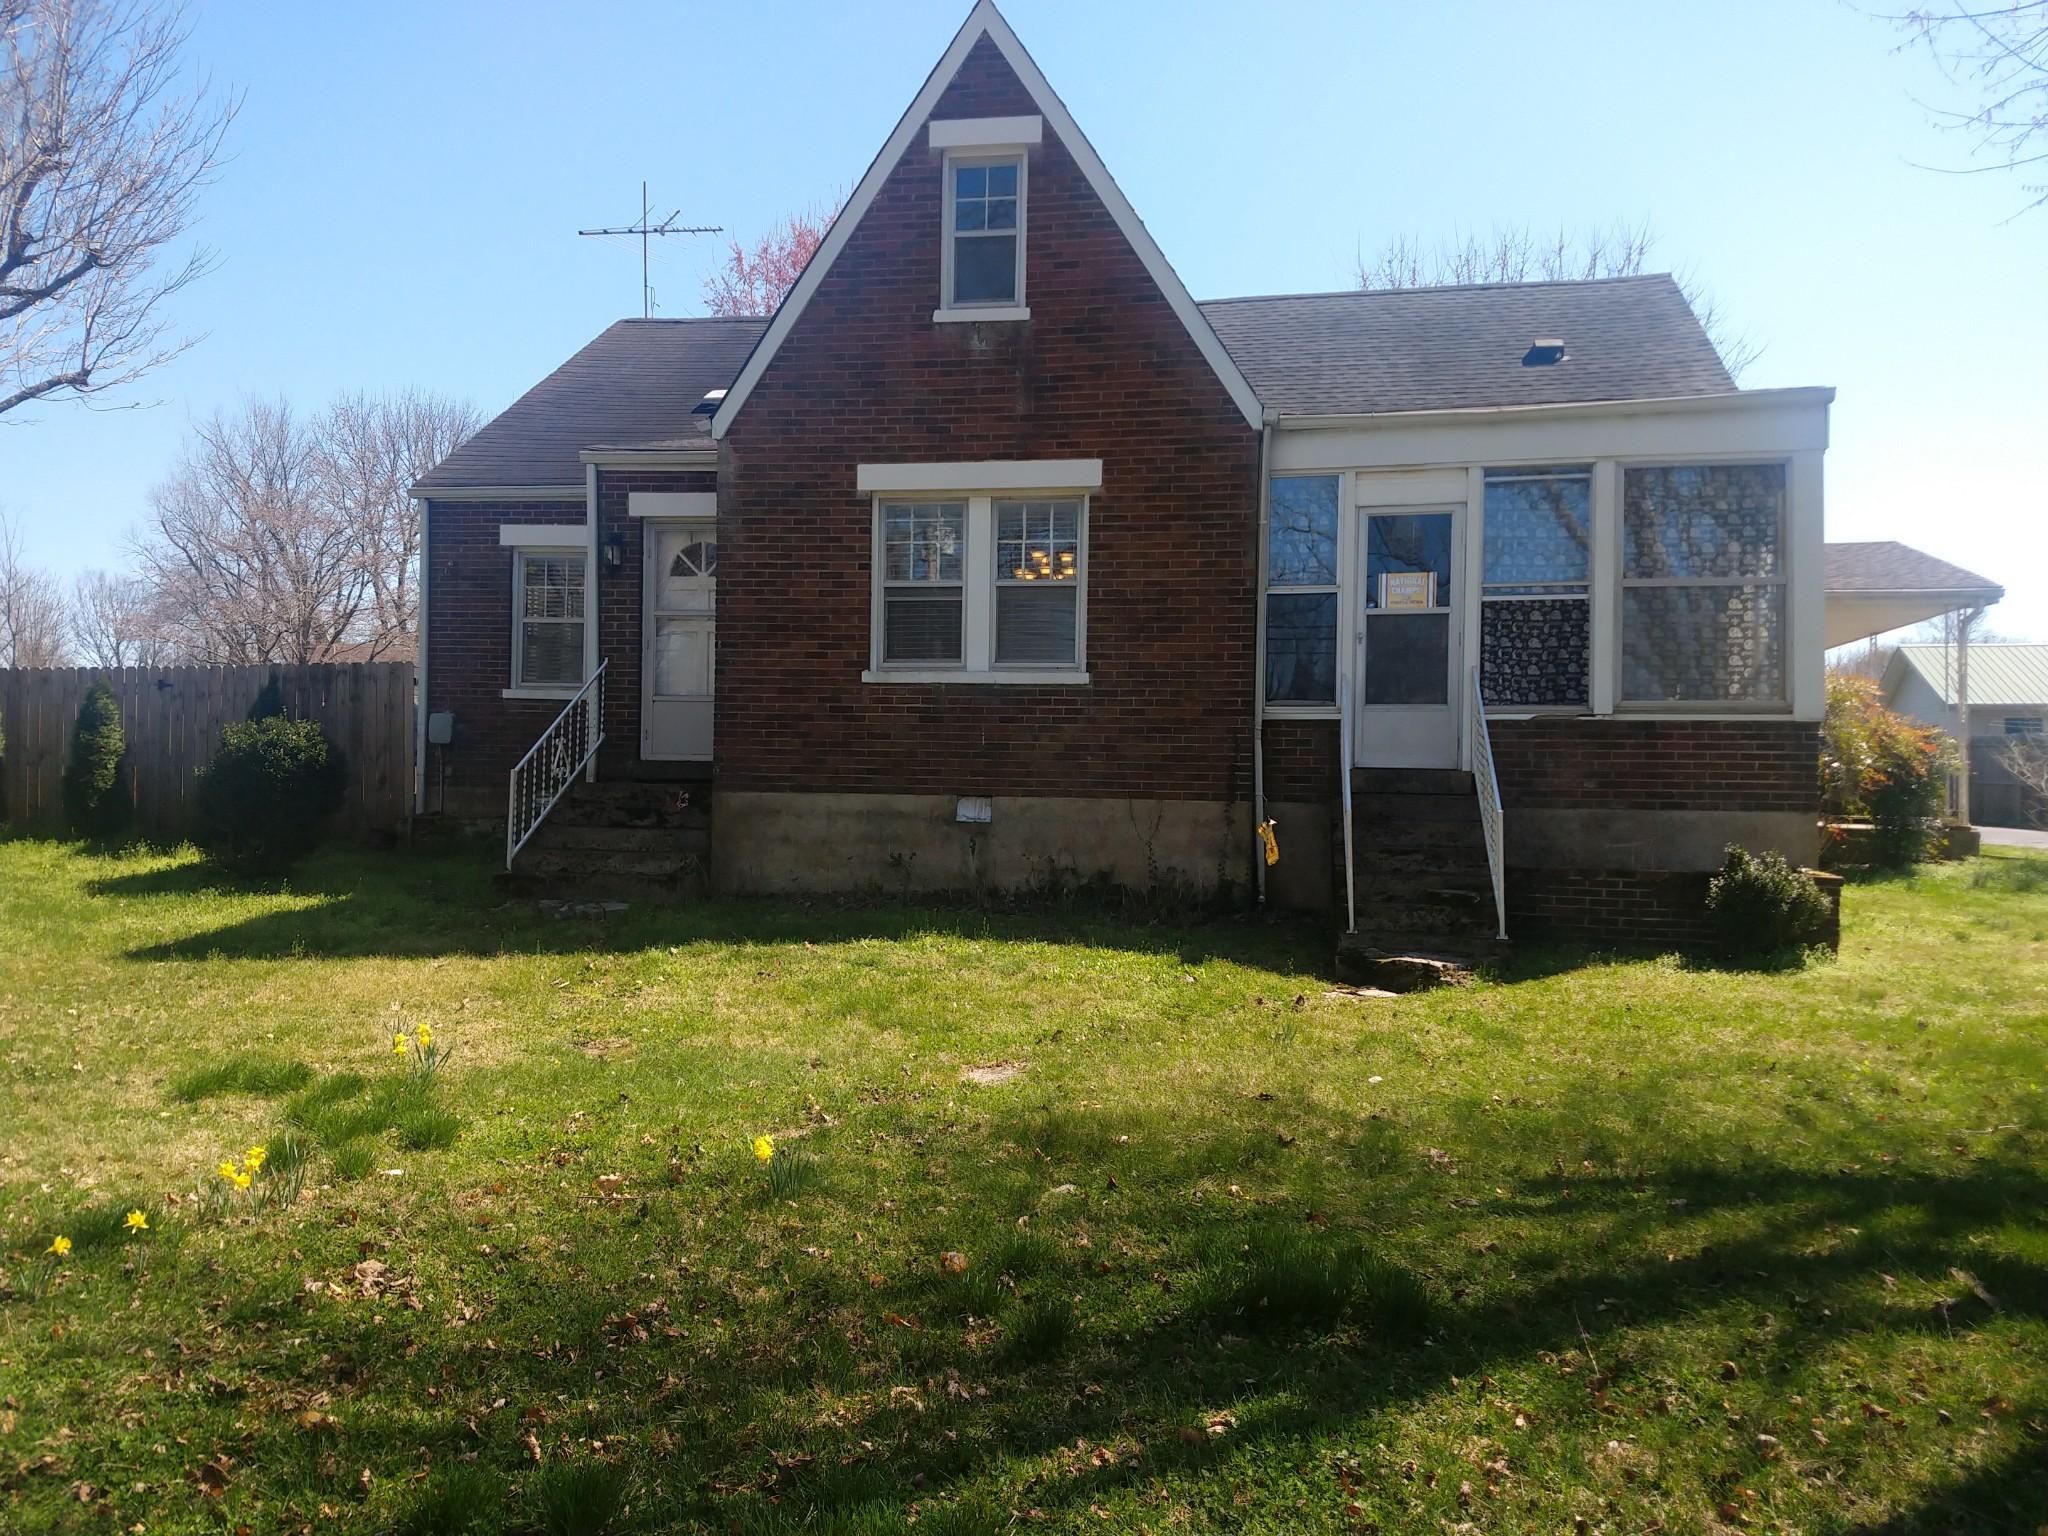 306 Main St Property Photo - Lafayette, TN real estate listing